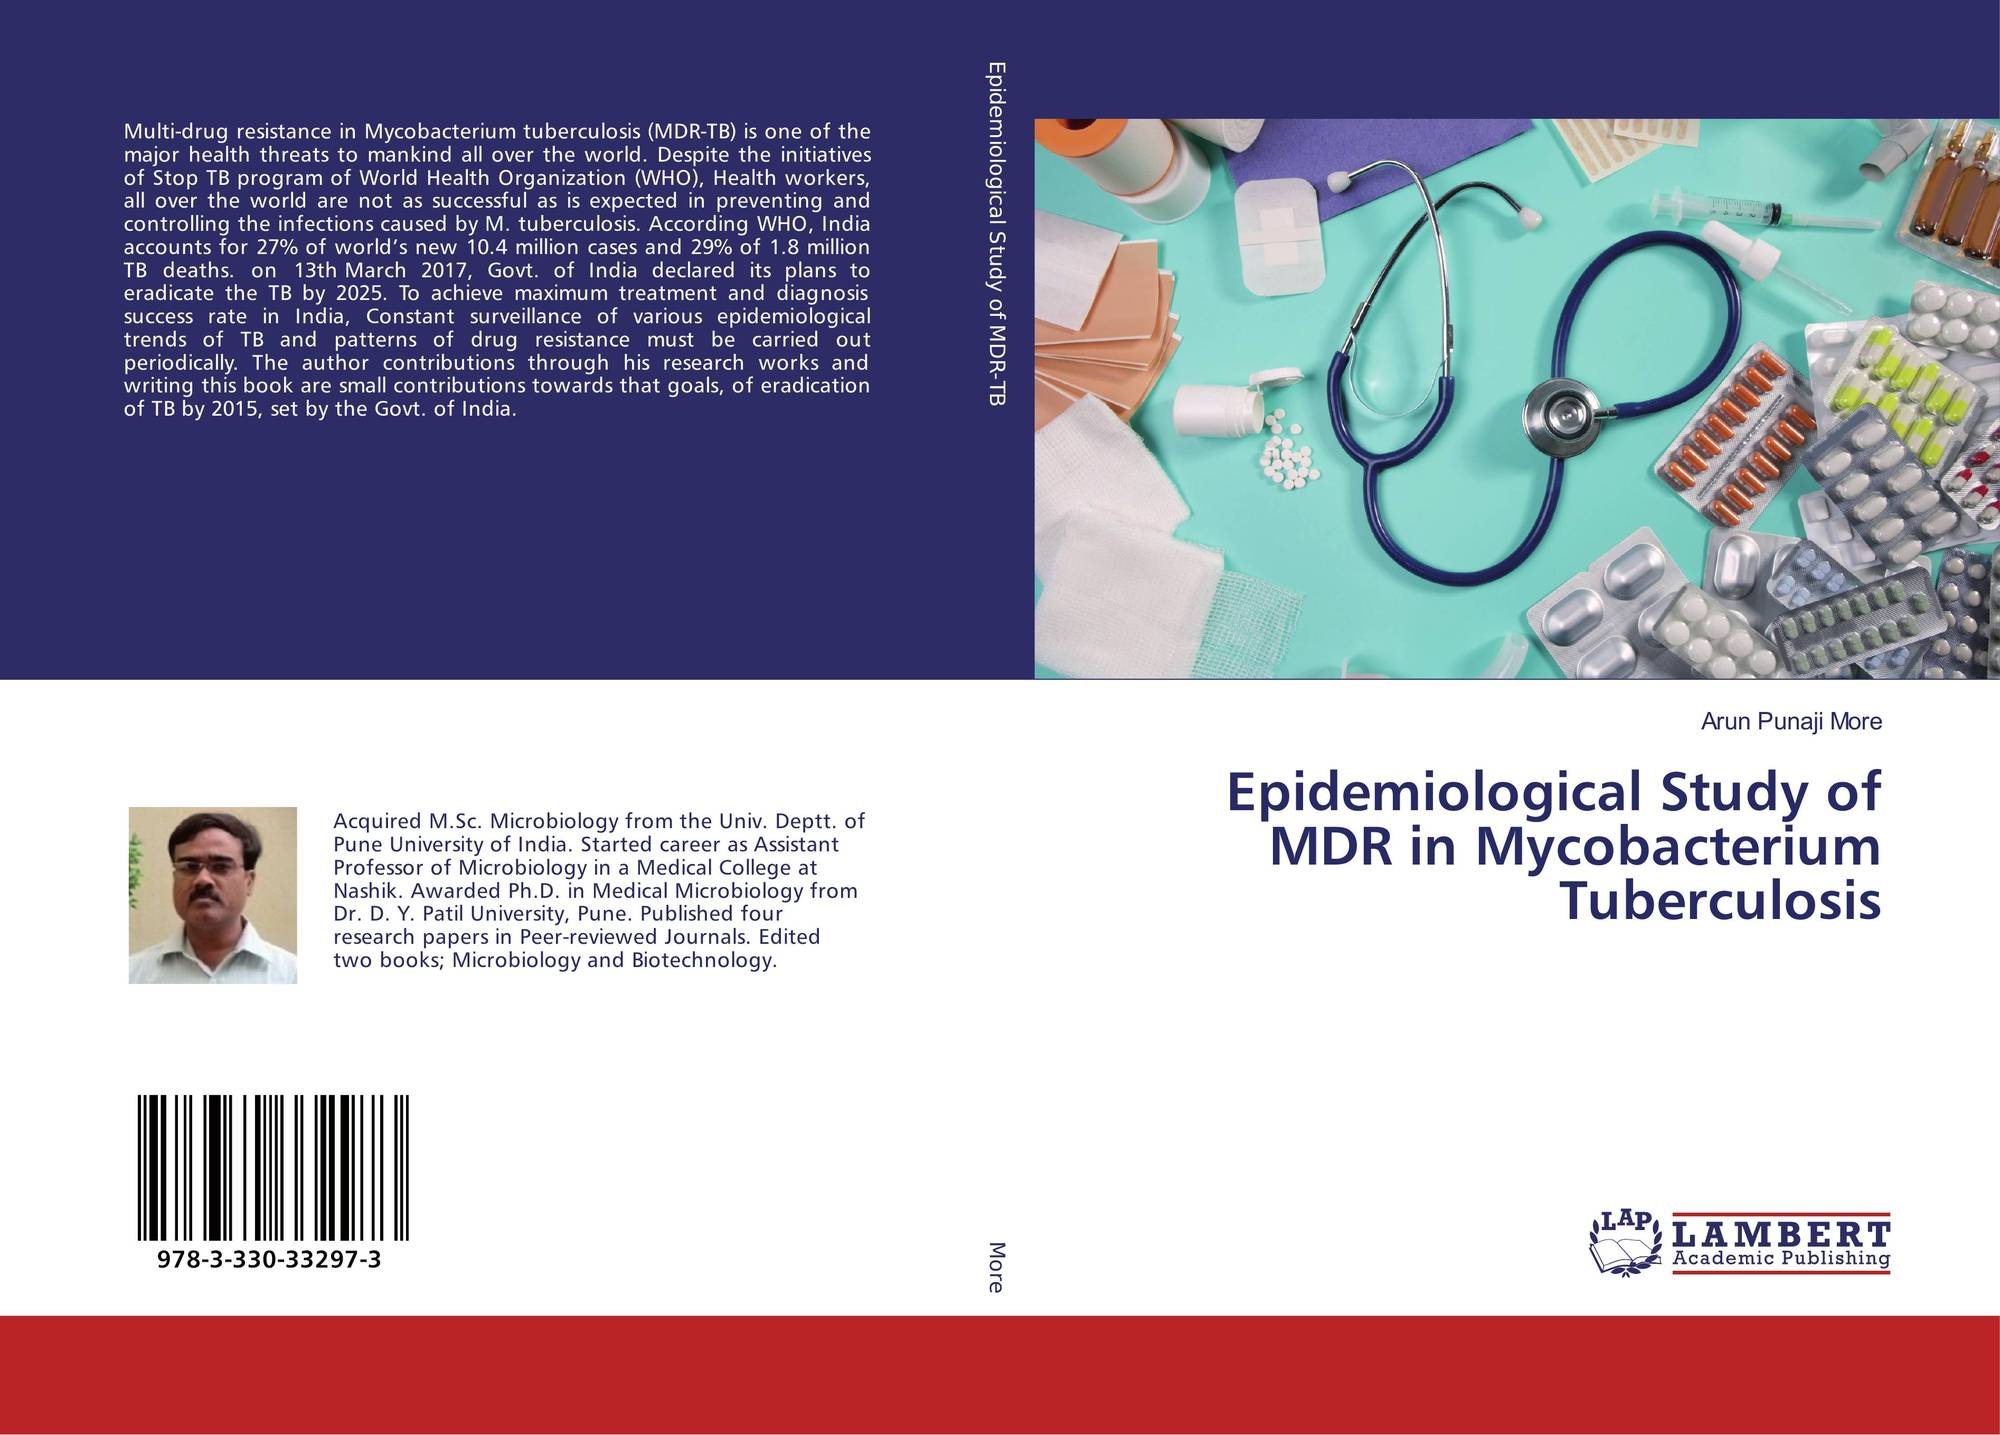 epidemiological study